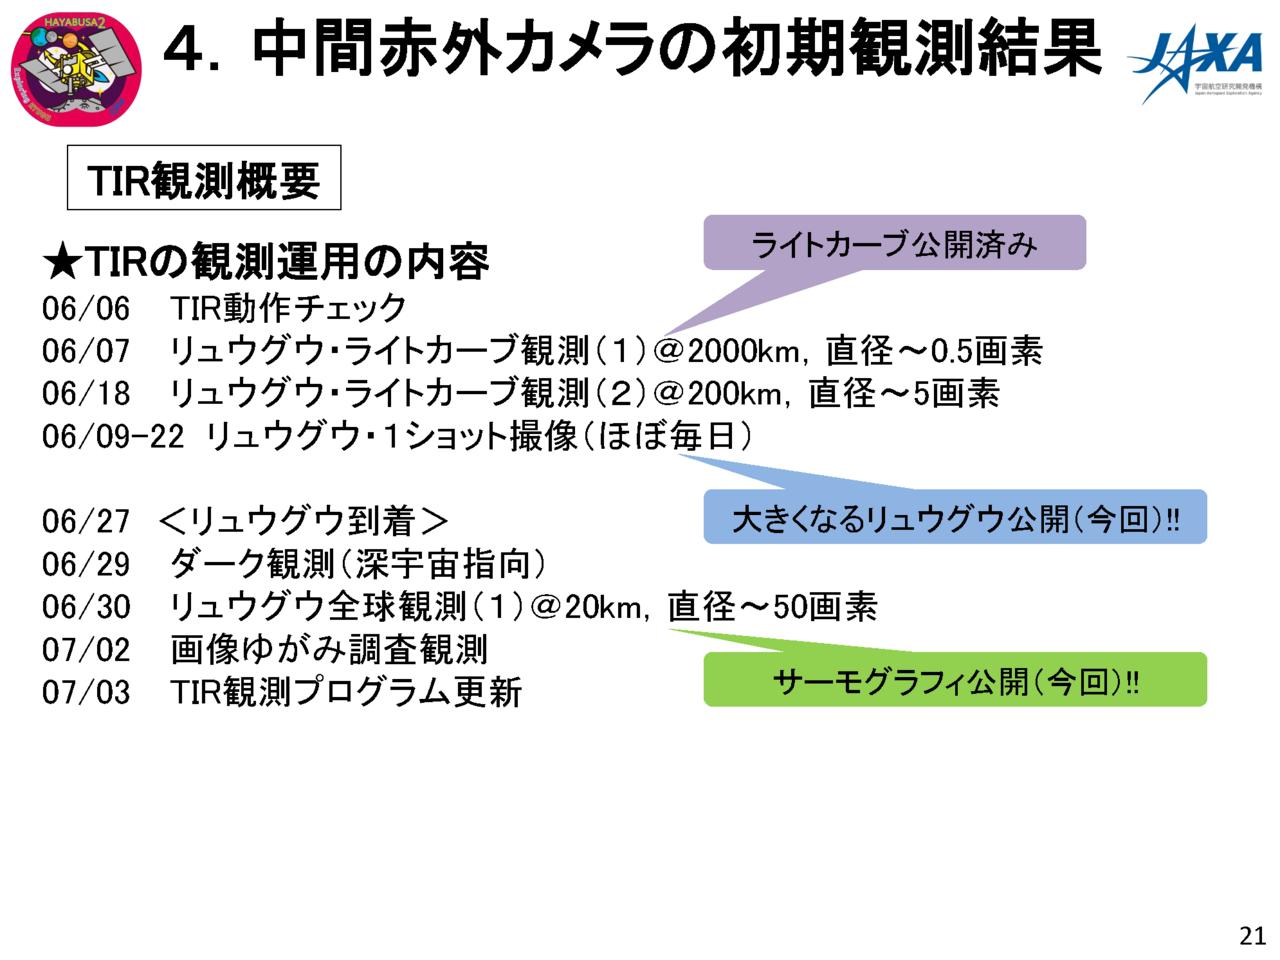 f:id:Imamura:20180719131716p:plain